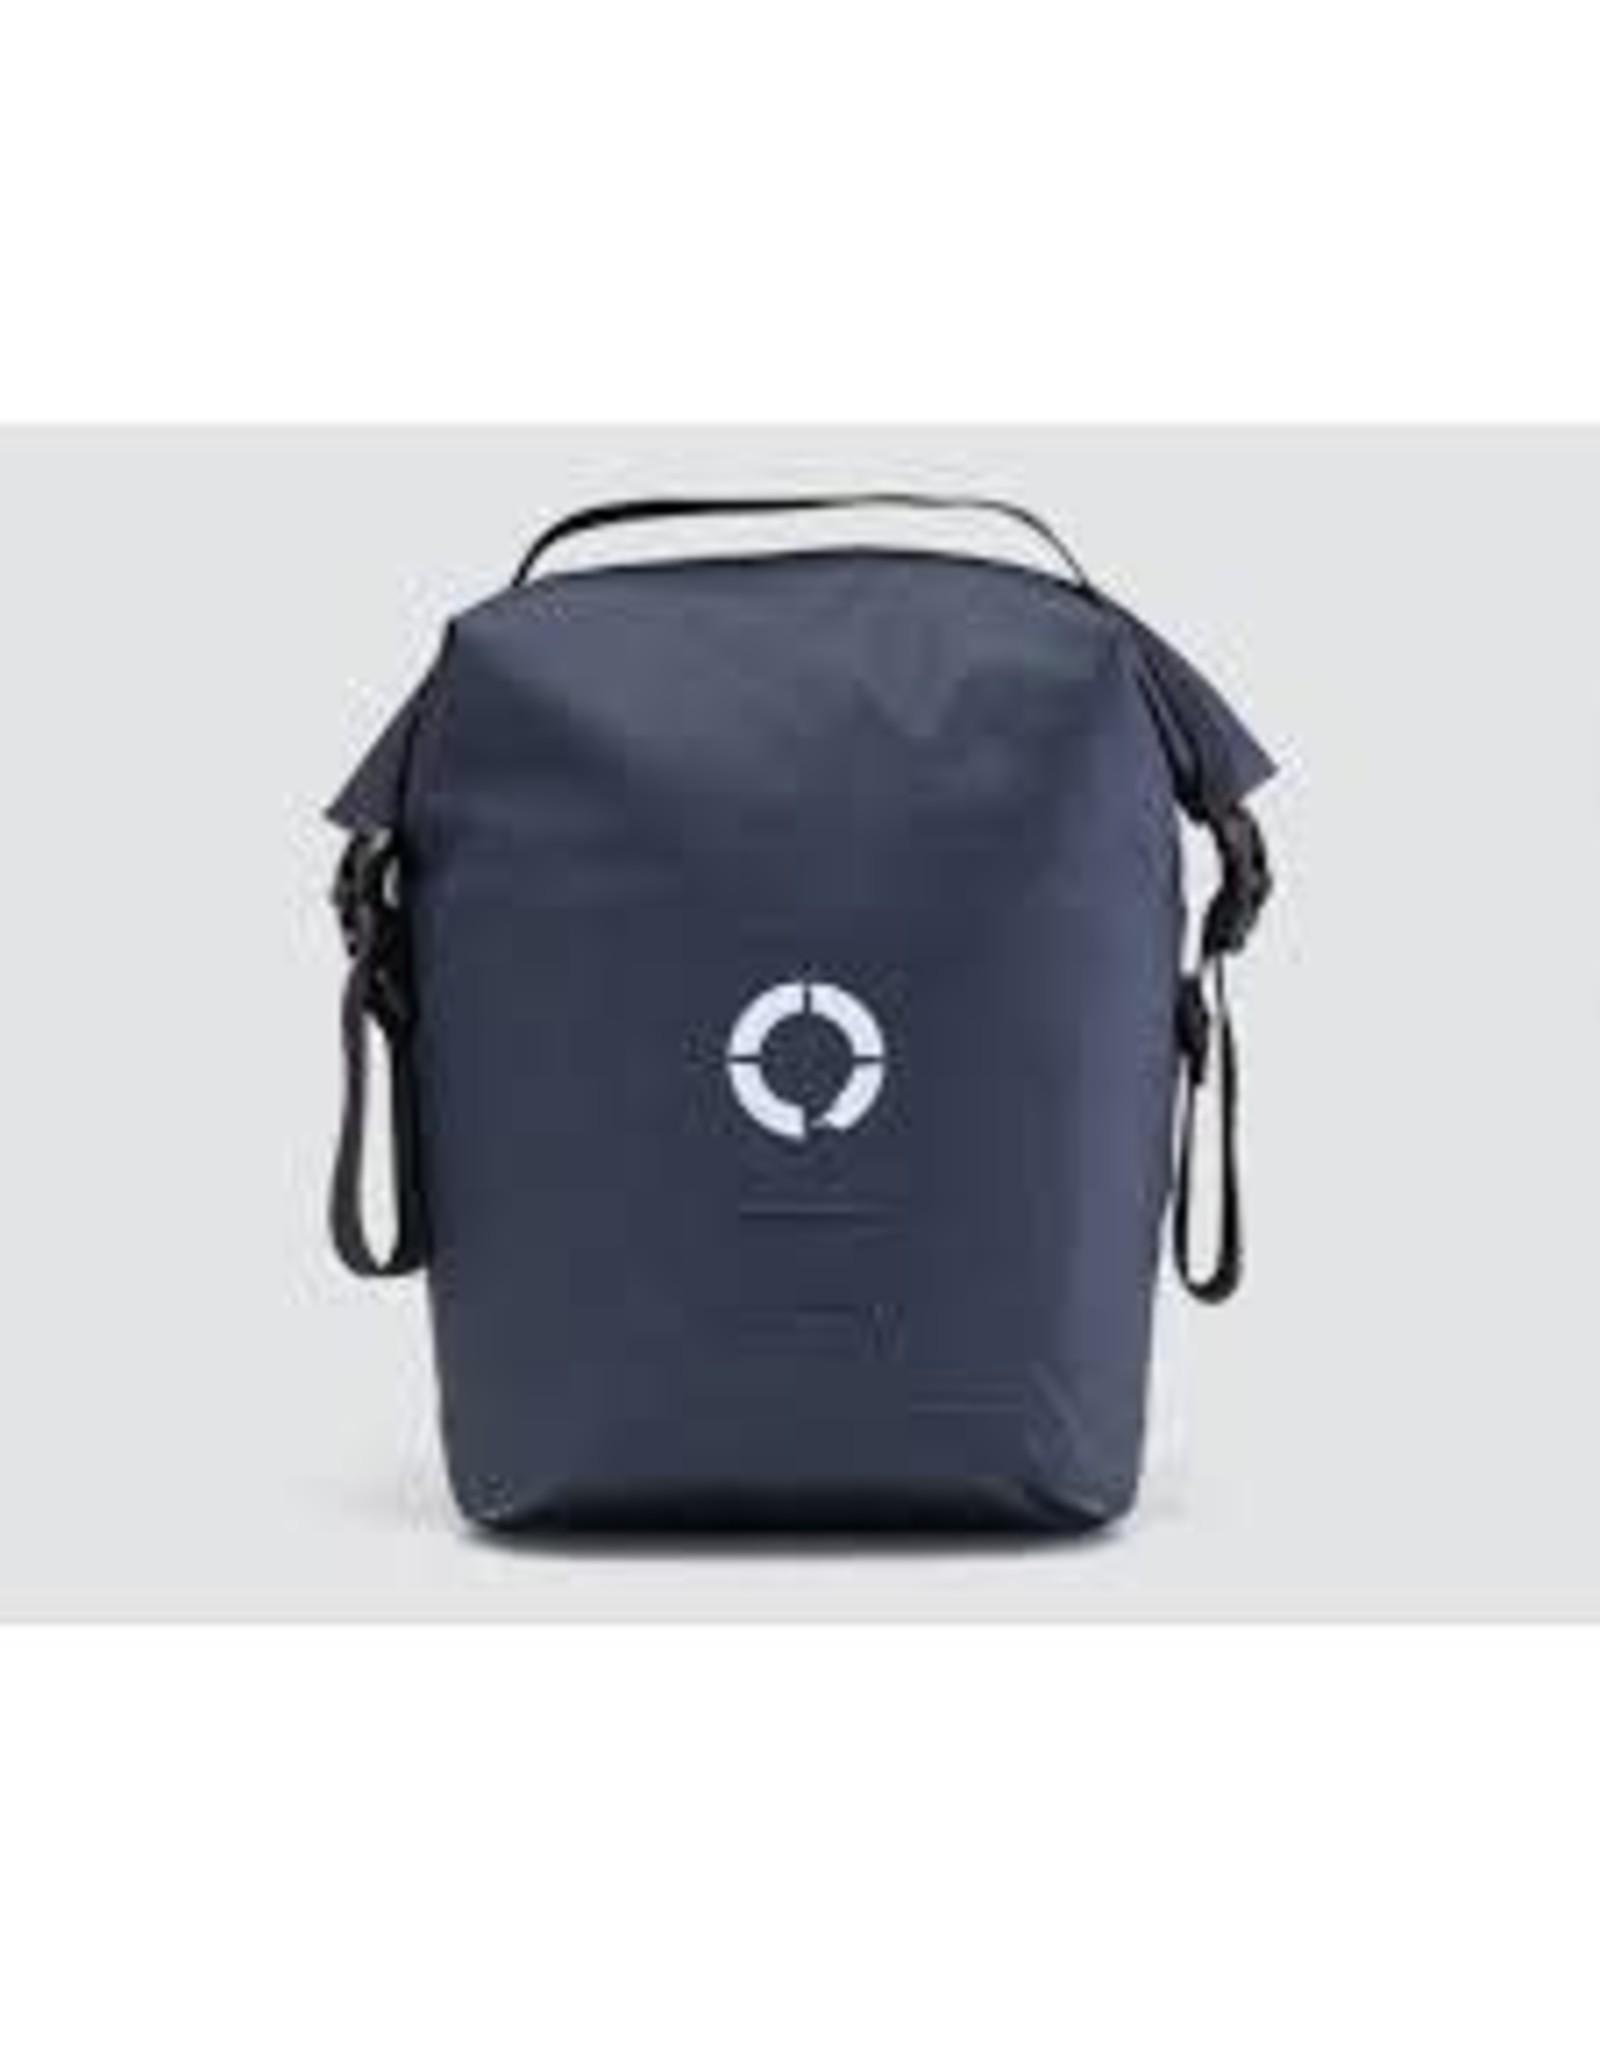 Roswheel PANIER Roswheel, Tour Handlebar Bag, Handlebar Bag, 5L, Blue